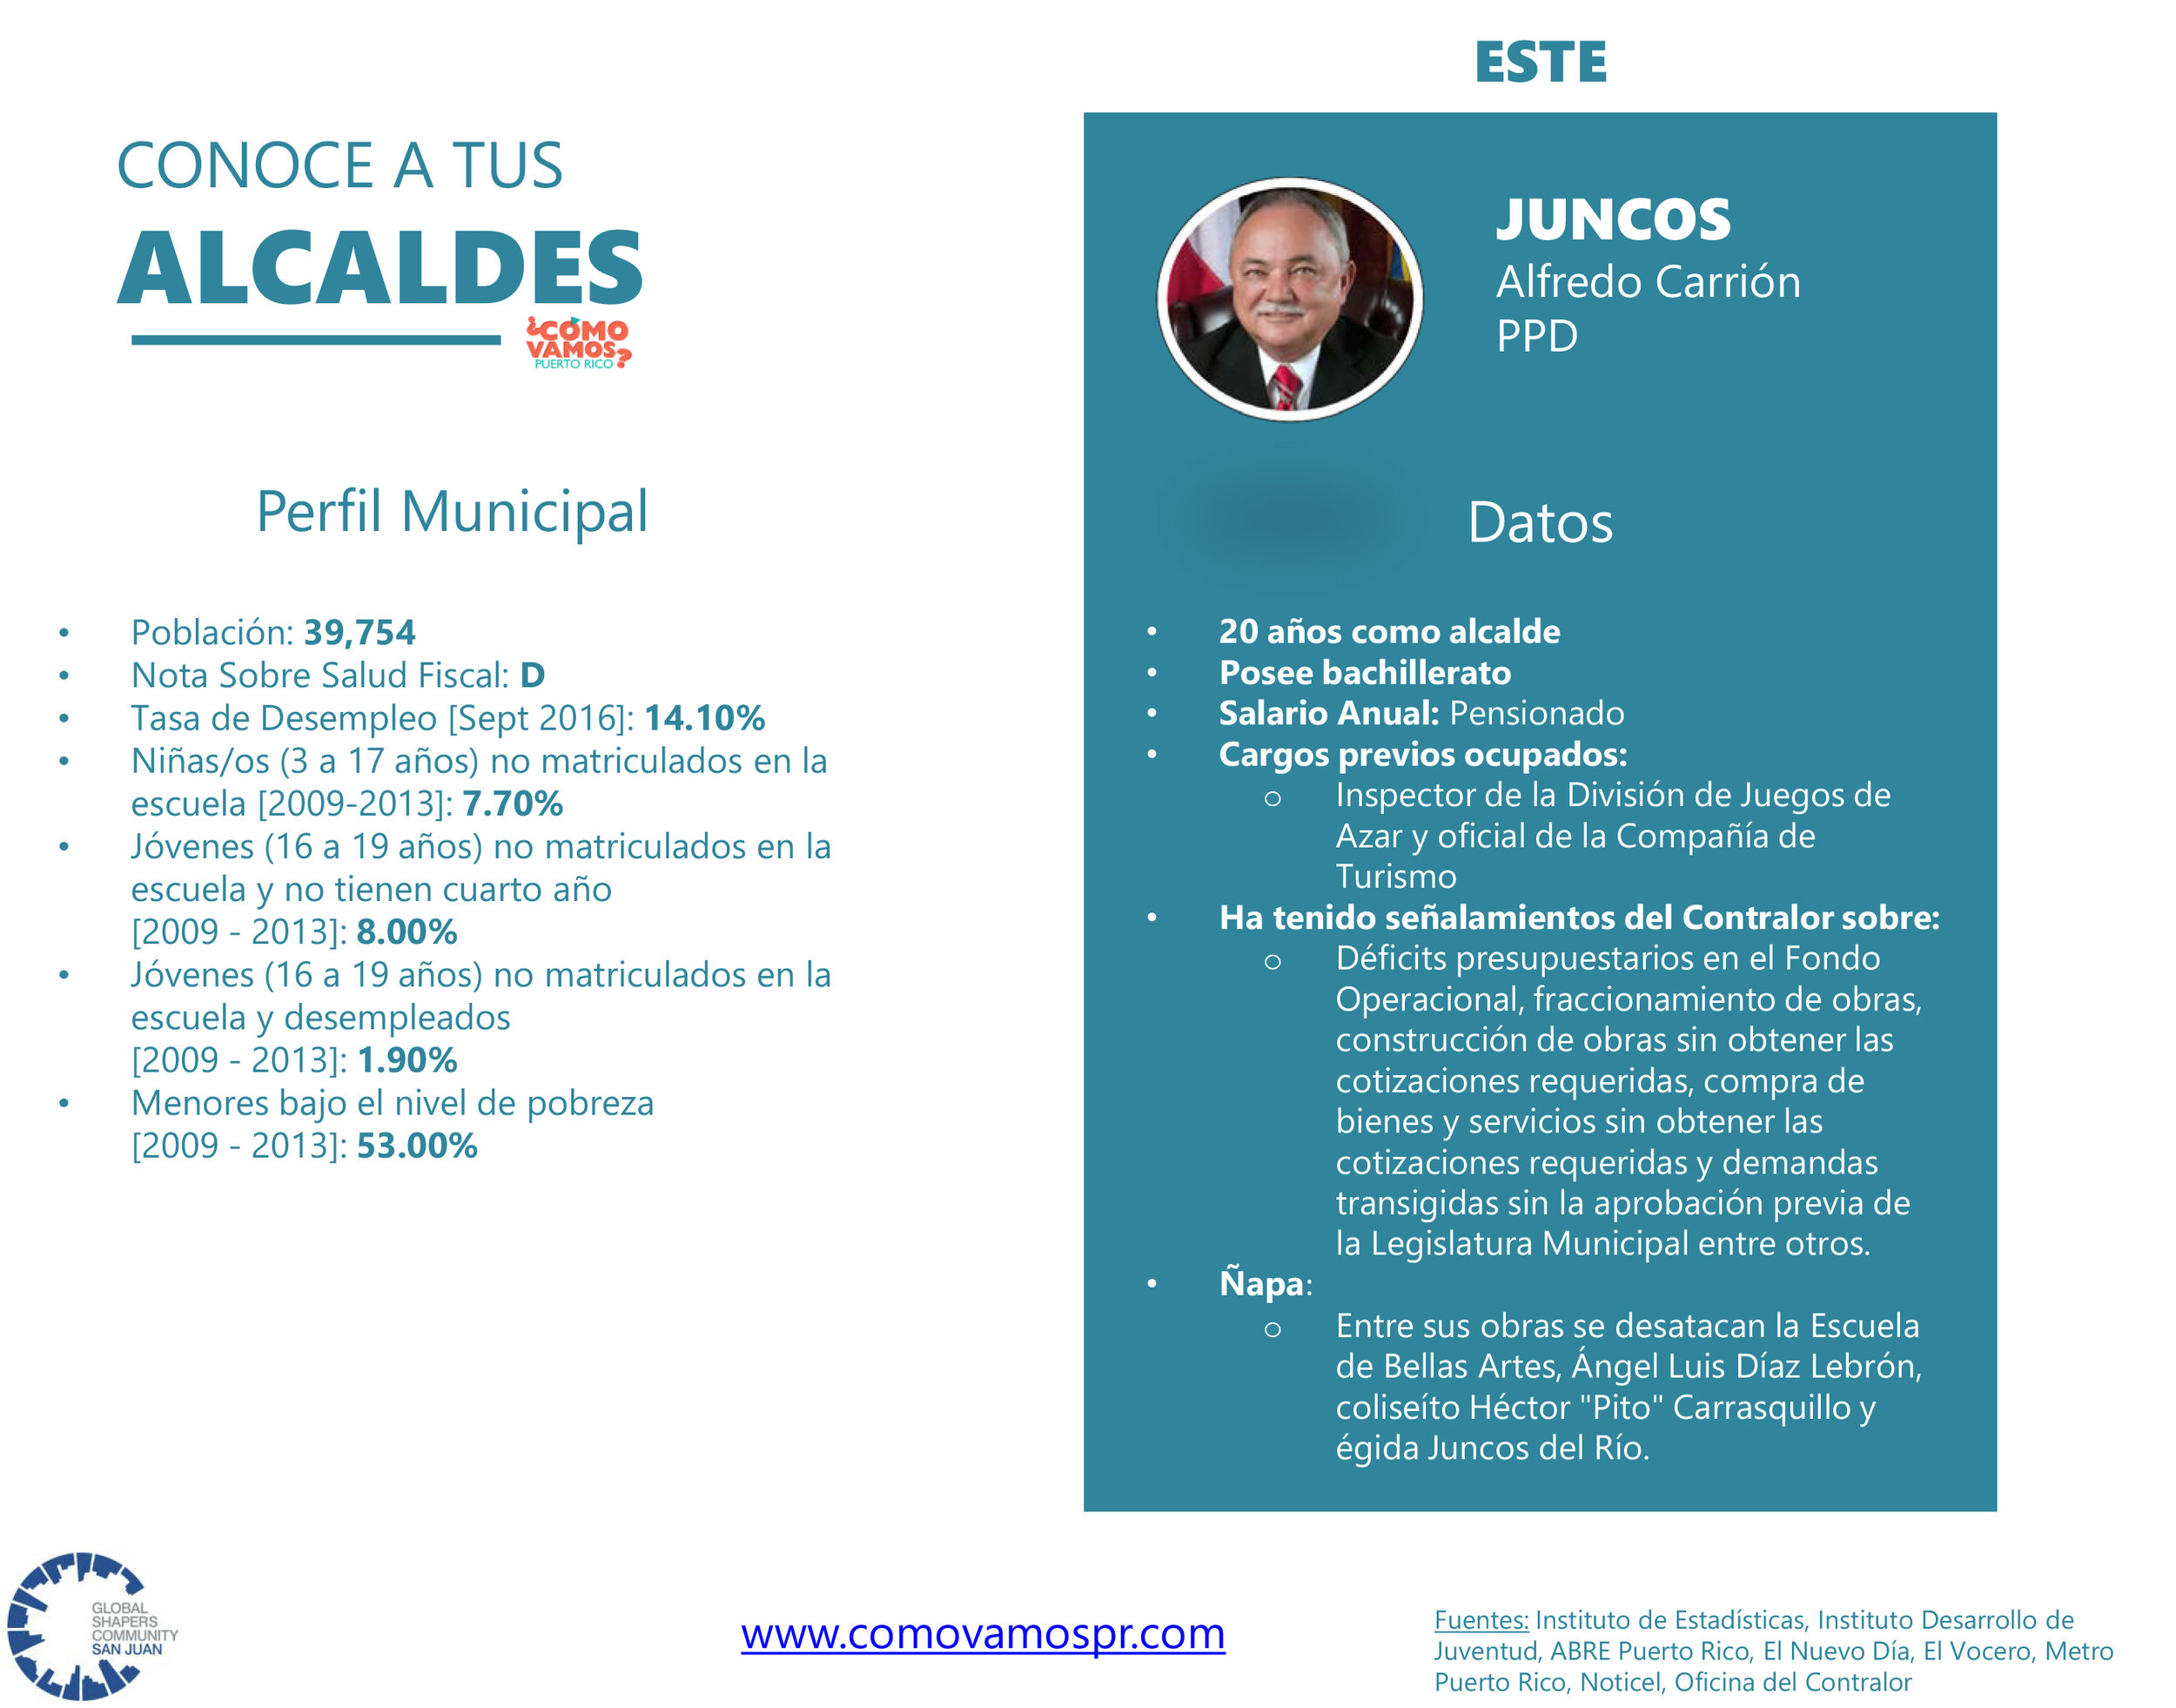 Alcaldes_Este_Juncos.jpg